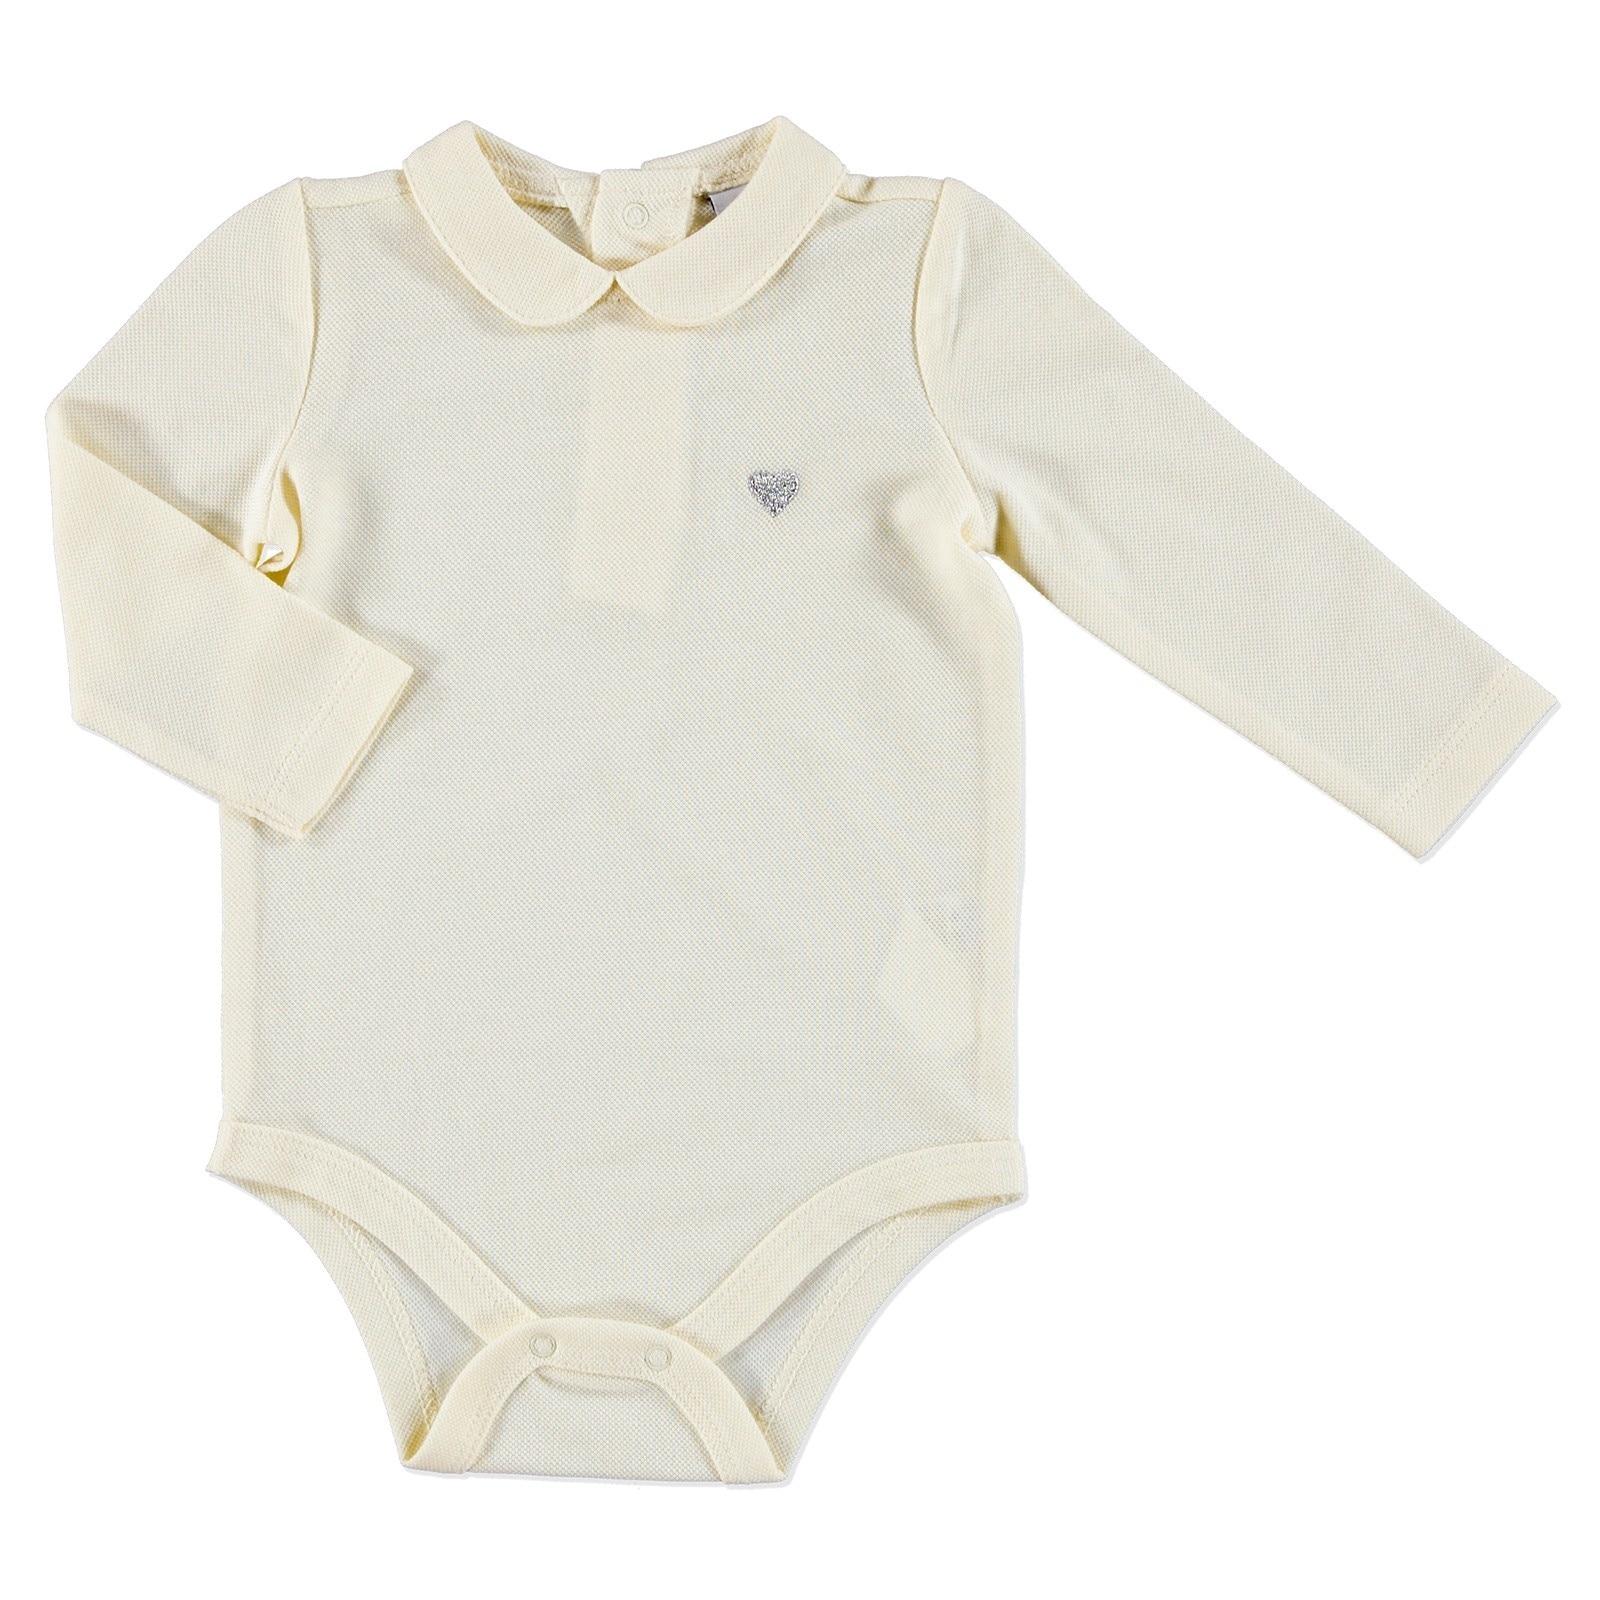 Ebebek HelloBaby Petter Pan Collar Baby Long Sleeve Bodysuit